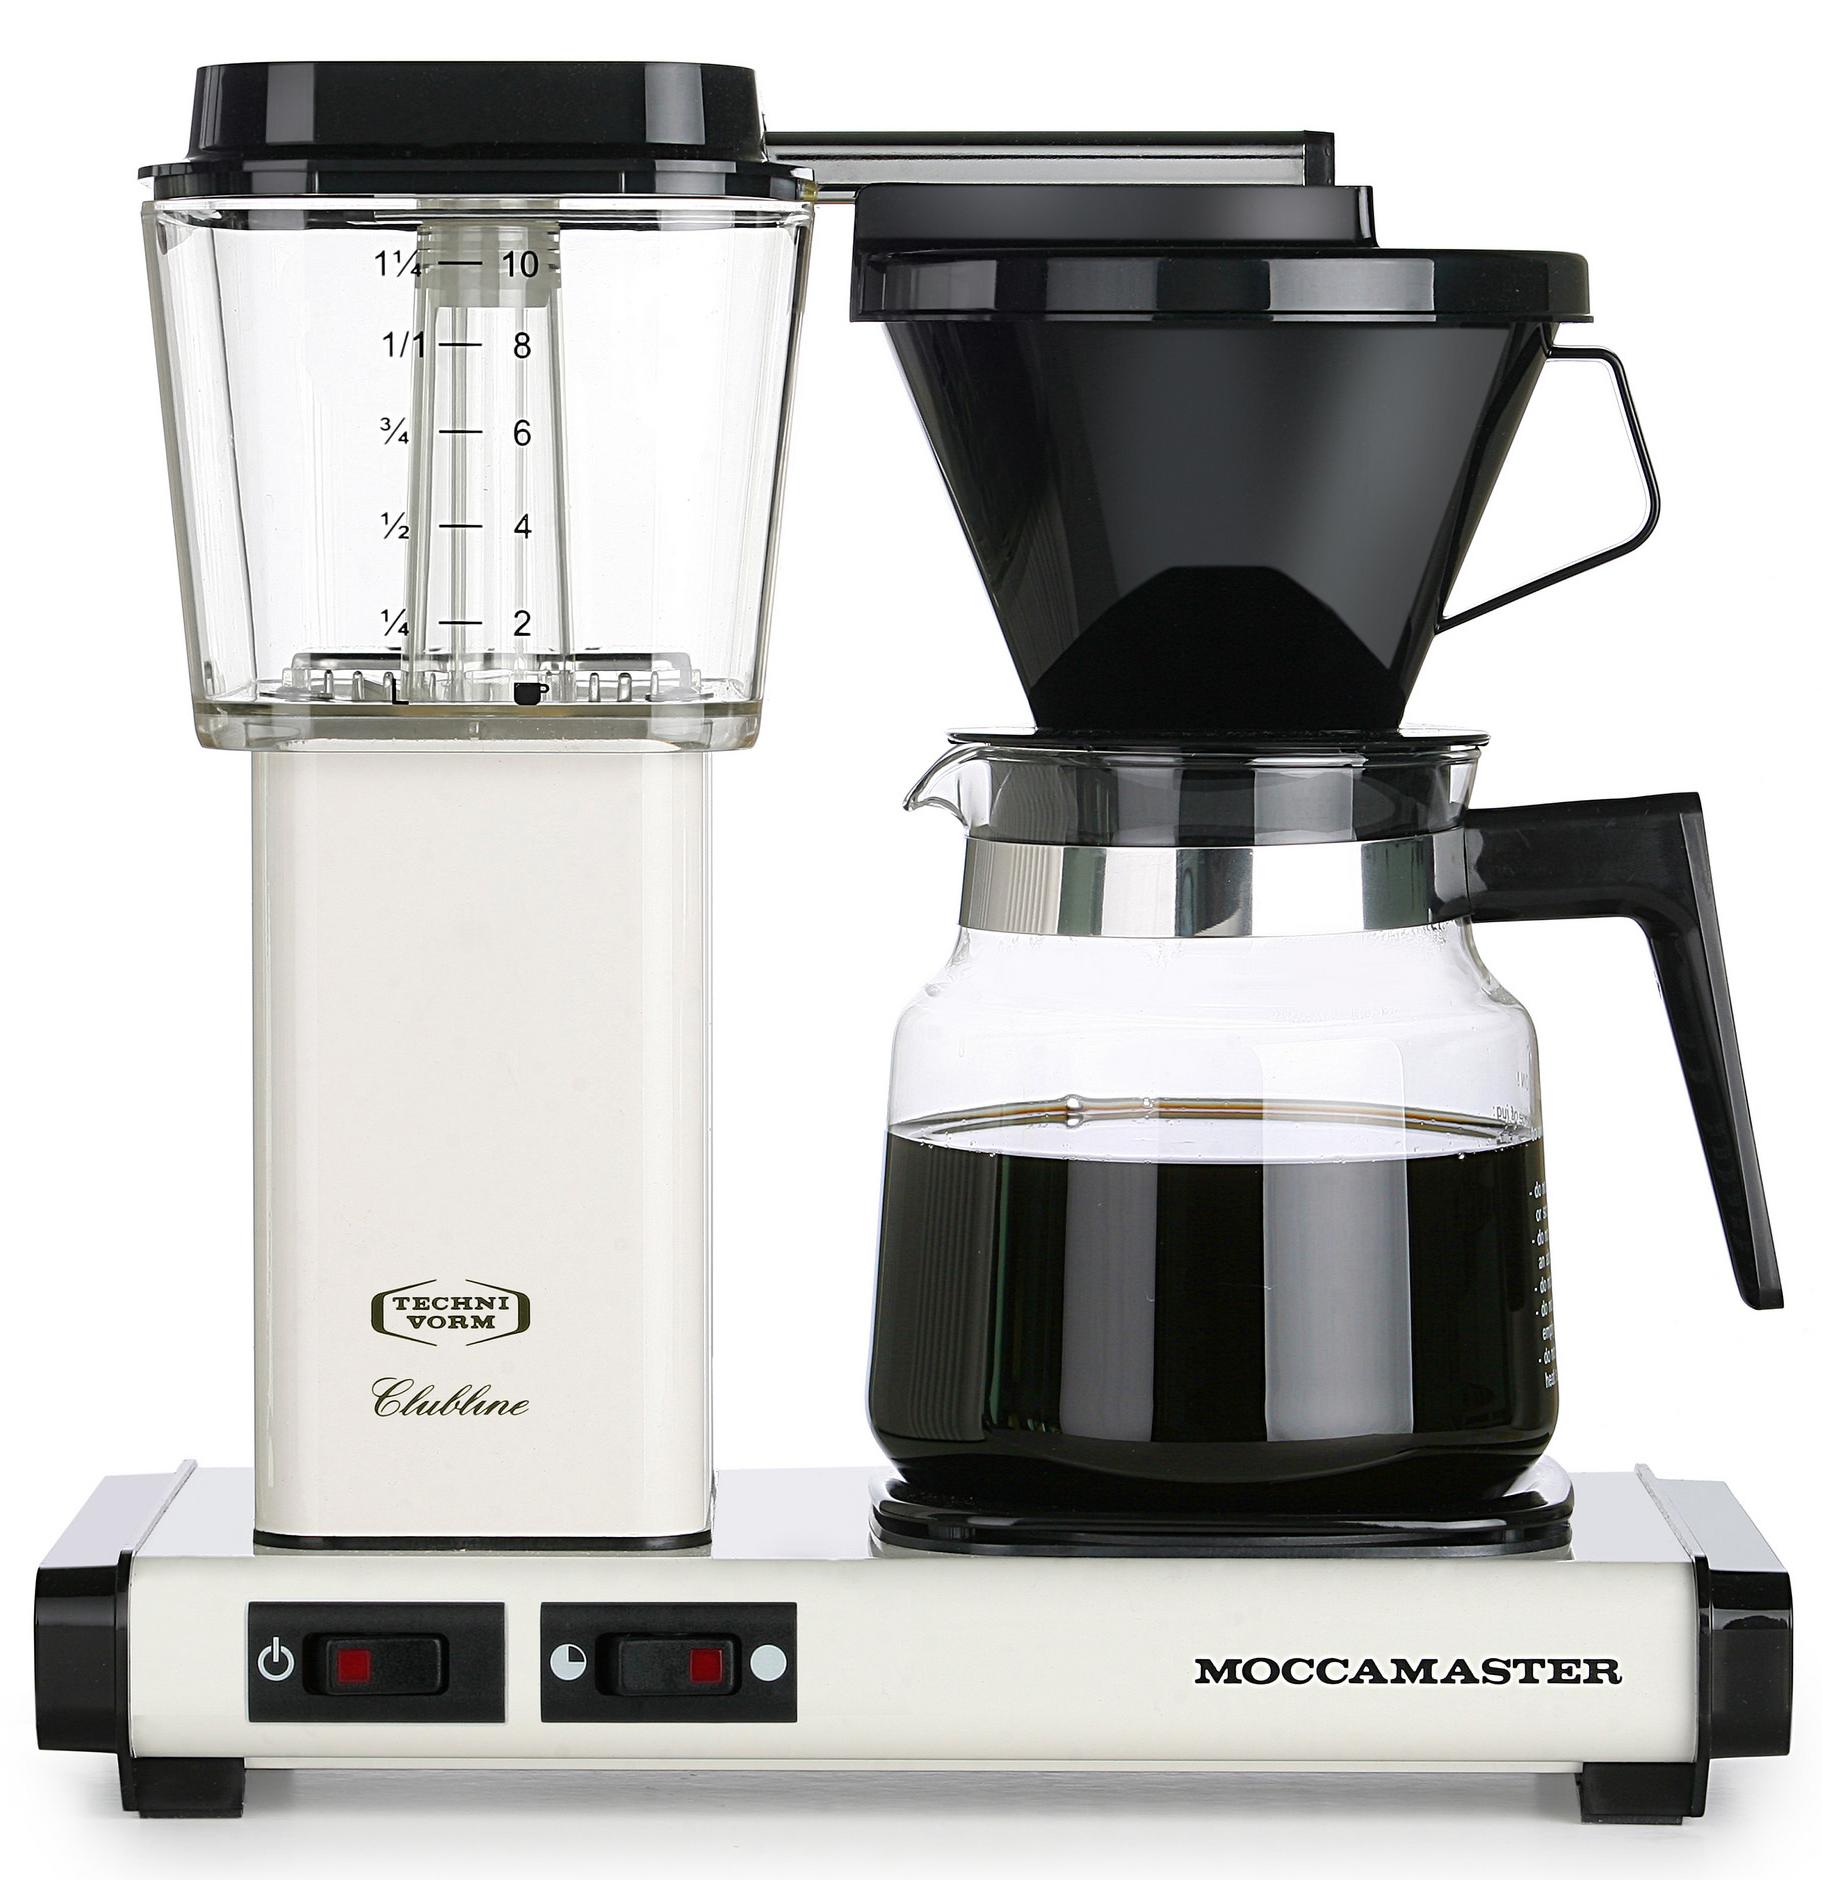 Moccamaster Kaffebryggare K942AO Cream